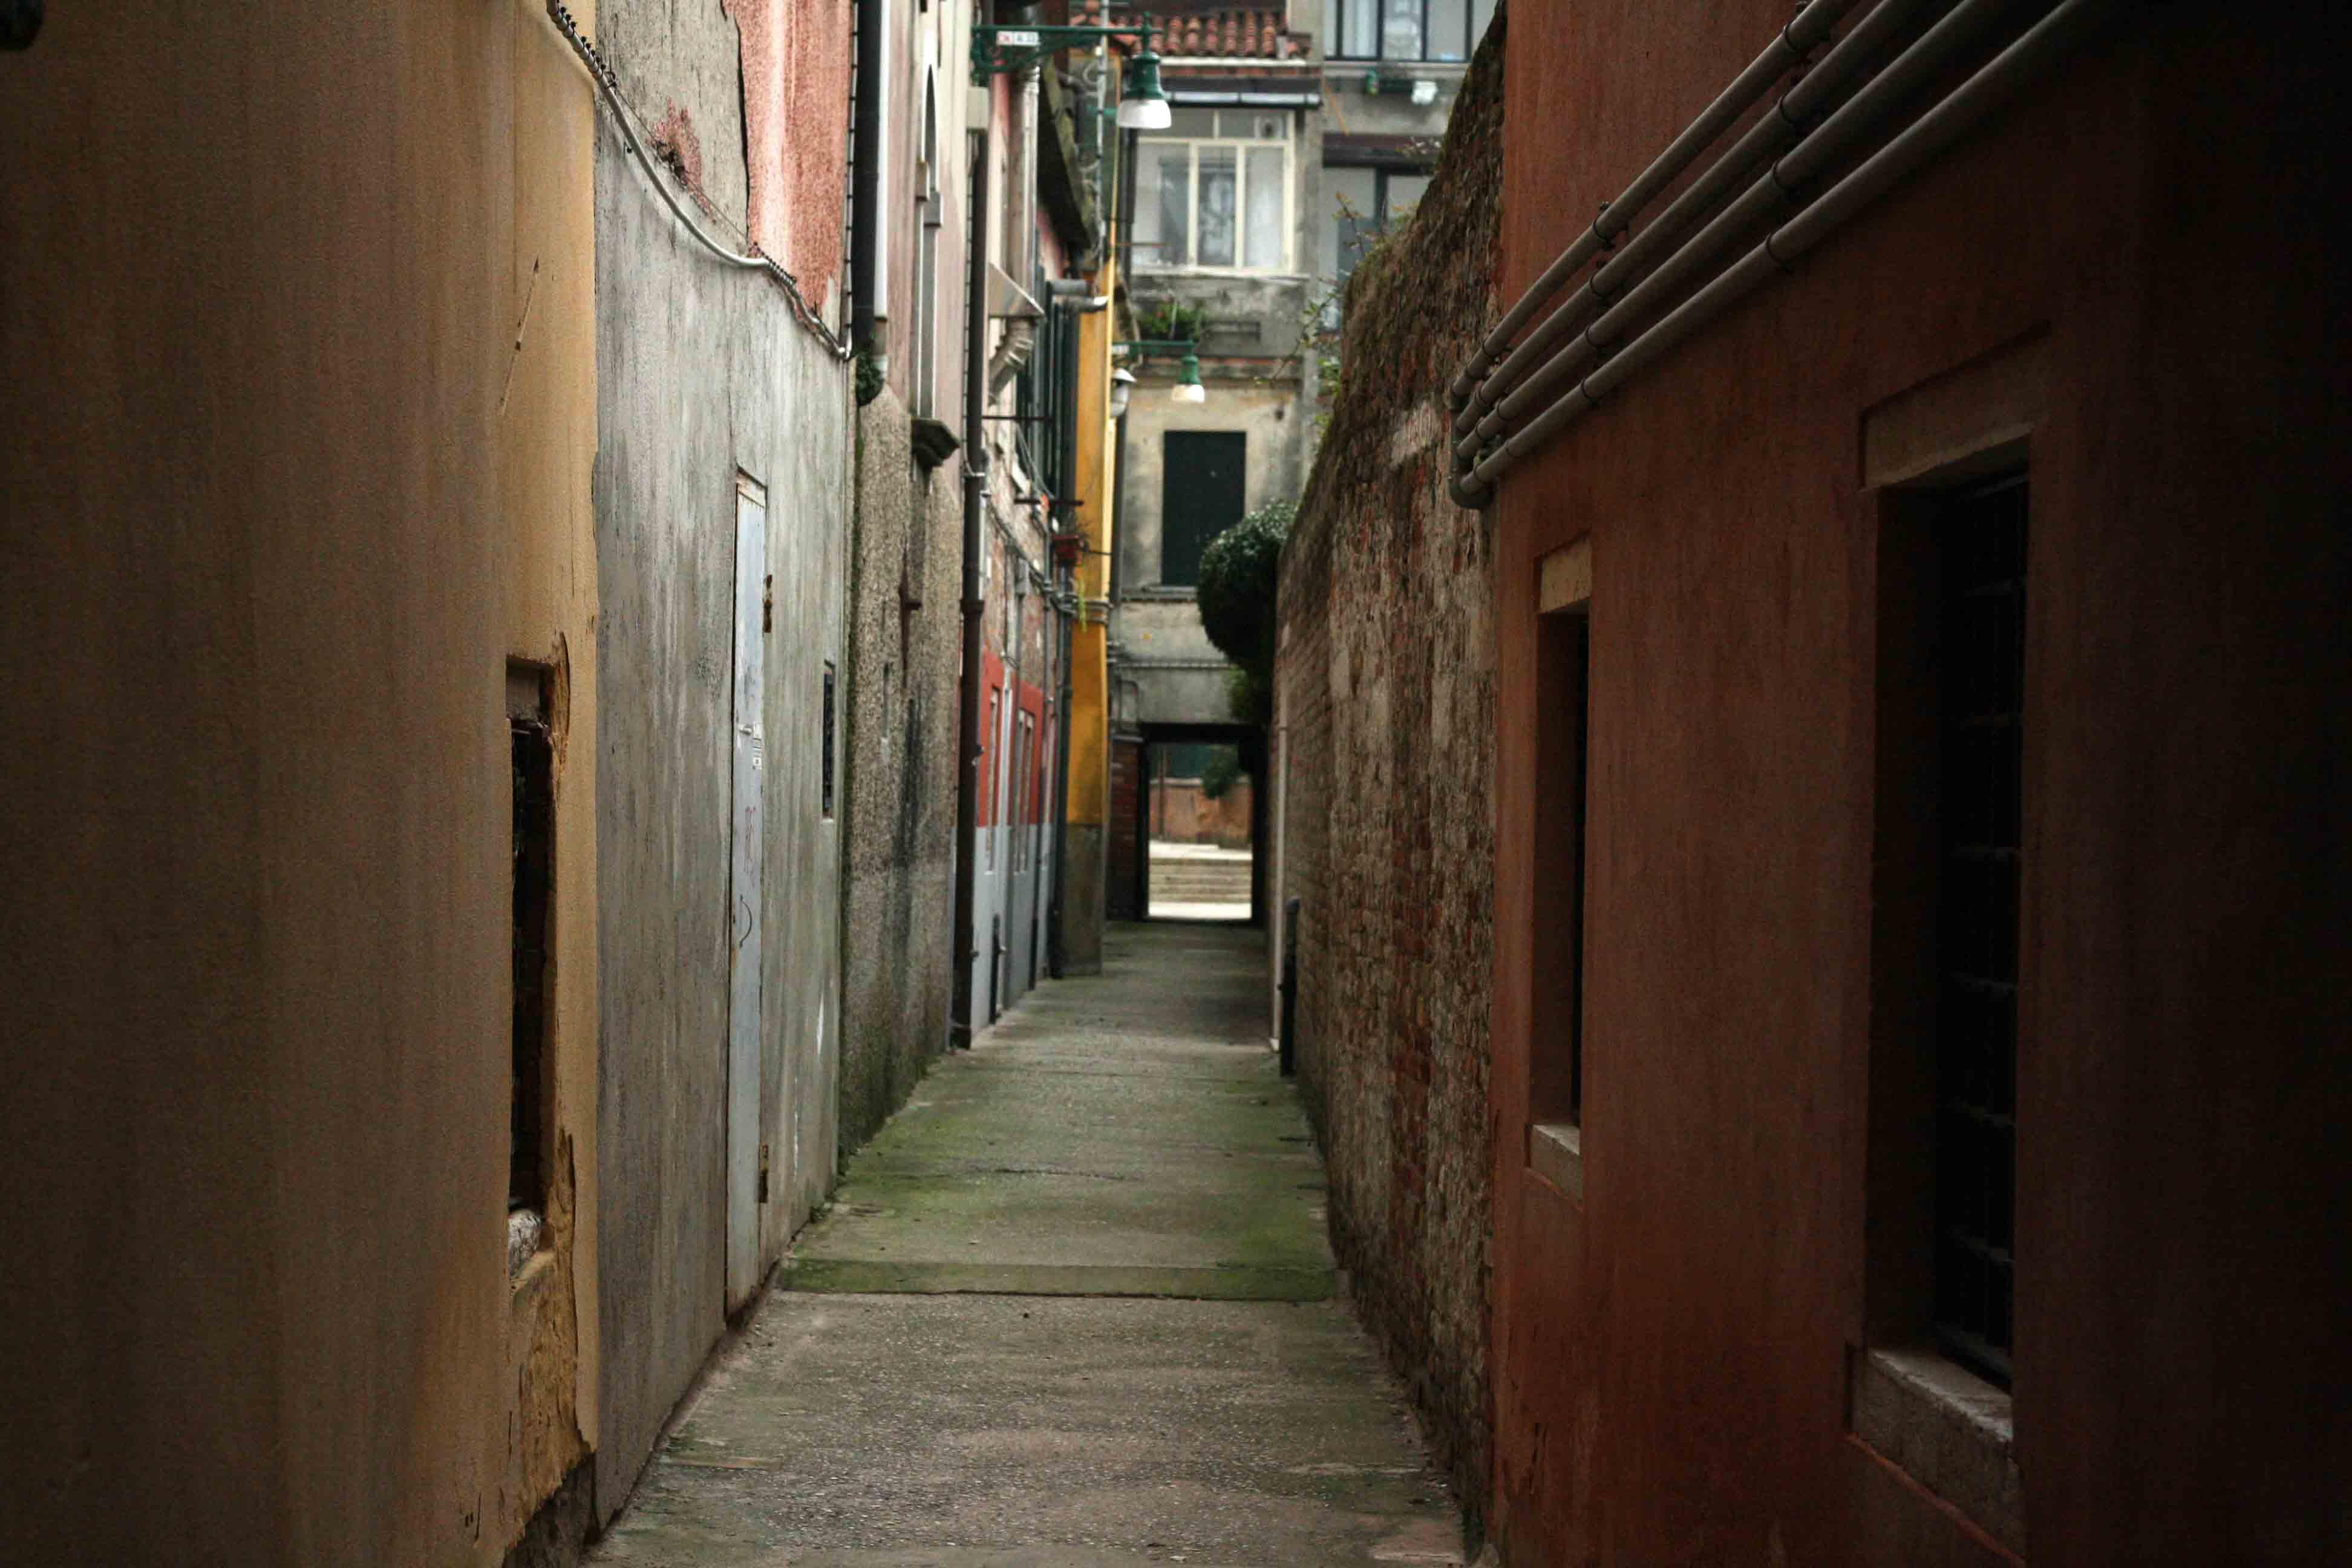 City Travel - Old Delhi Streets, Venice